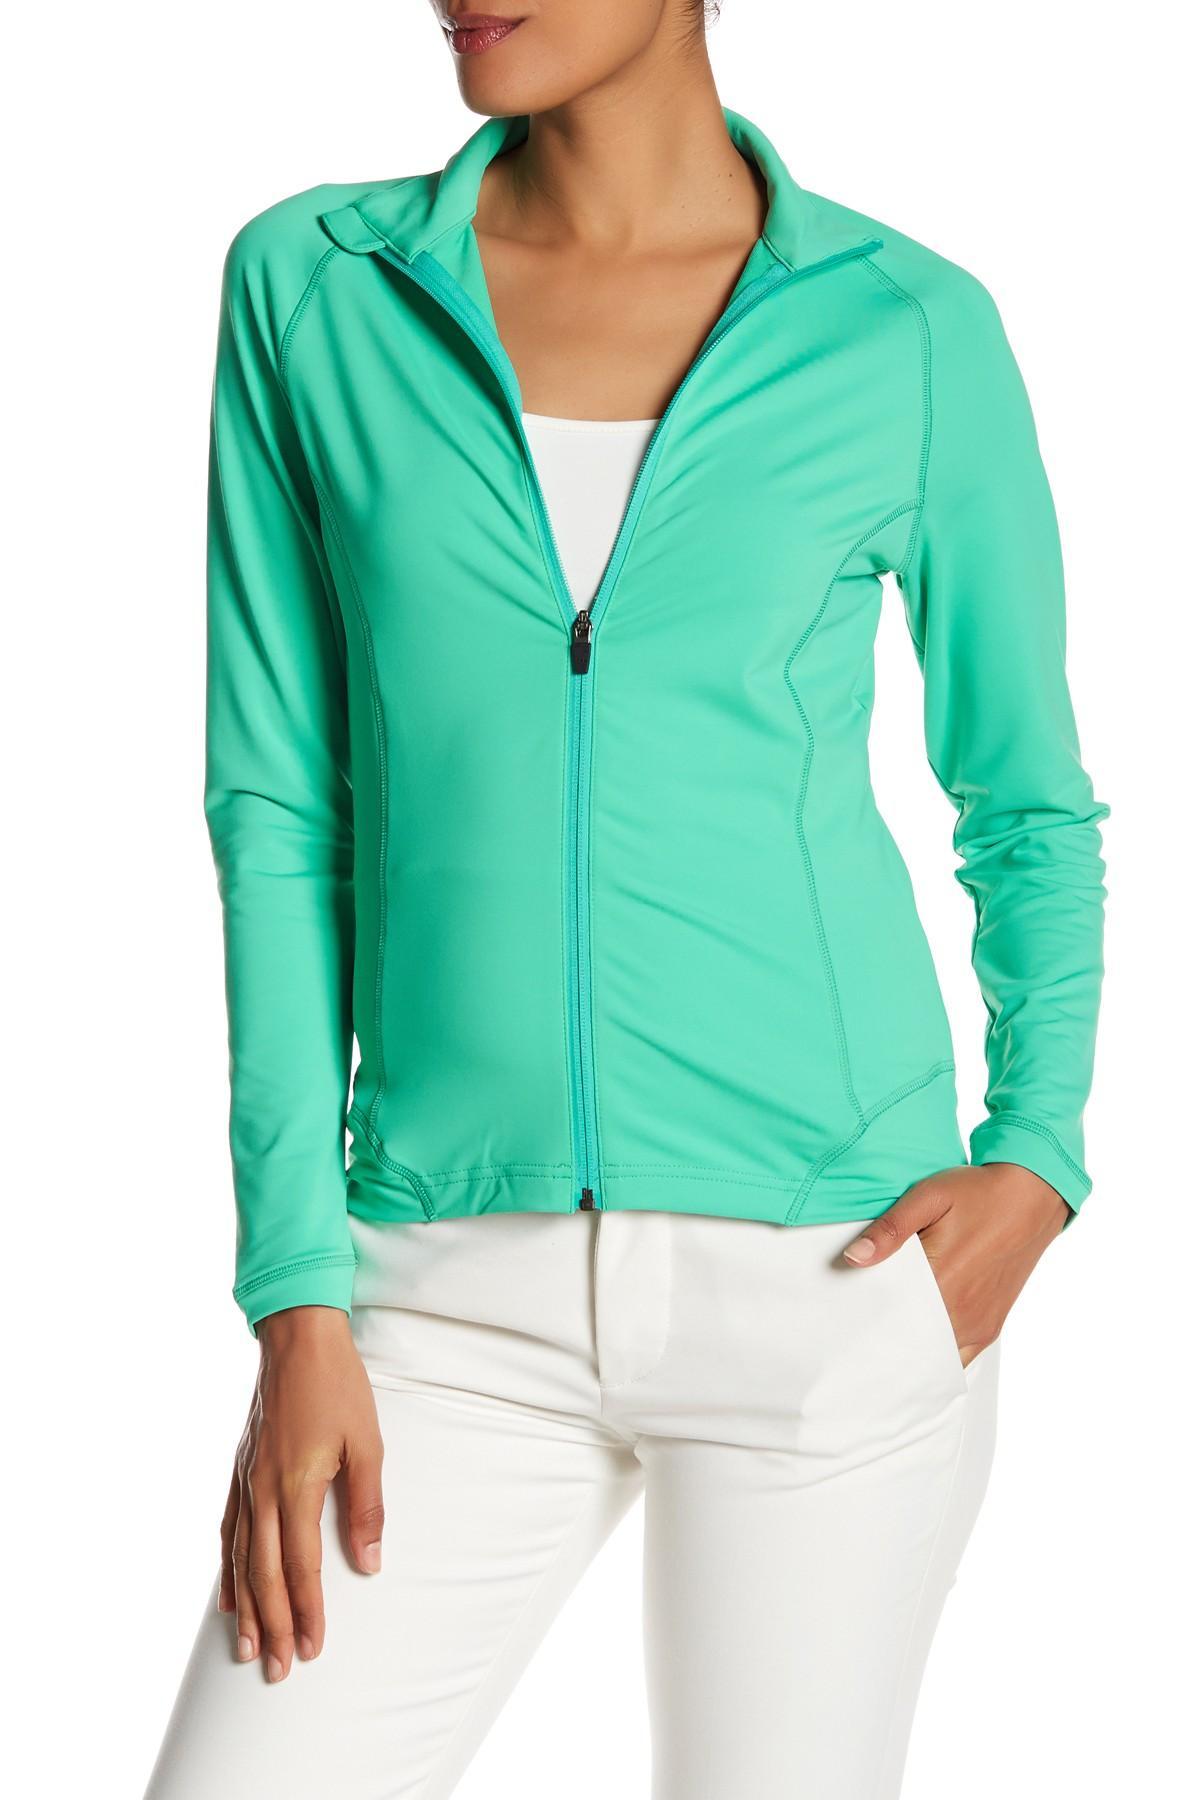 Lyst Peter Millar Tamara Full Zip Solid Layer Jacket In